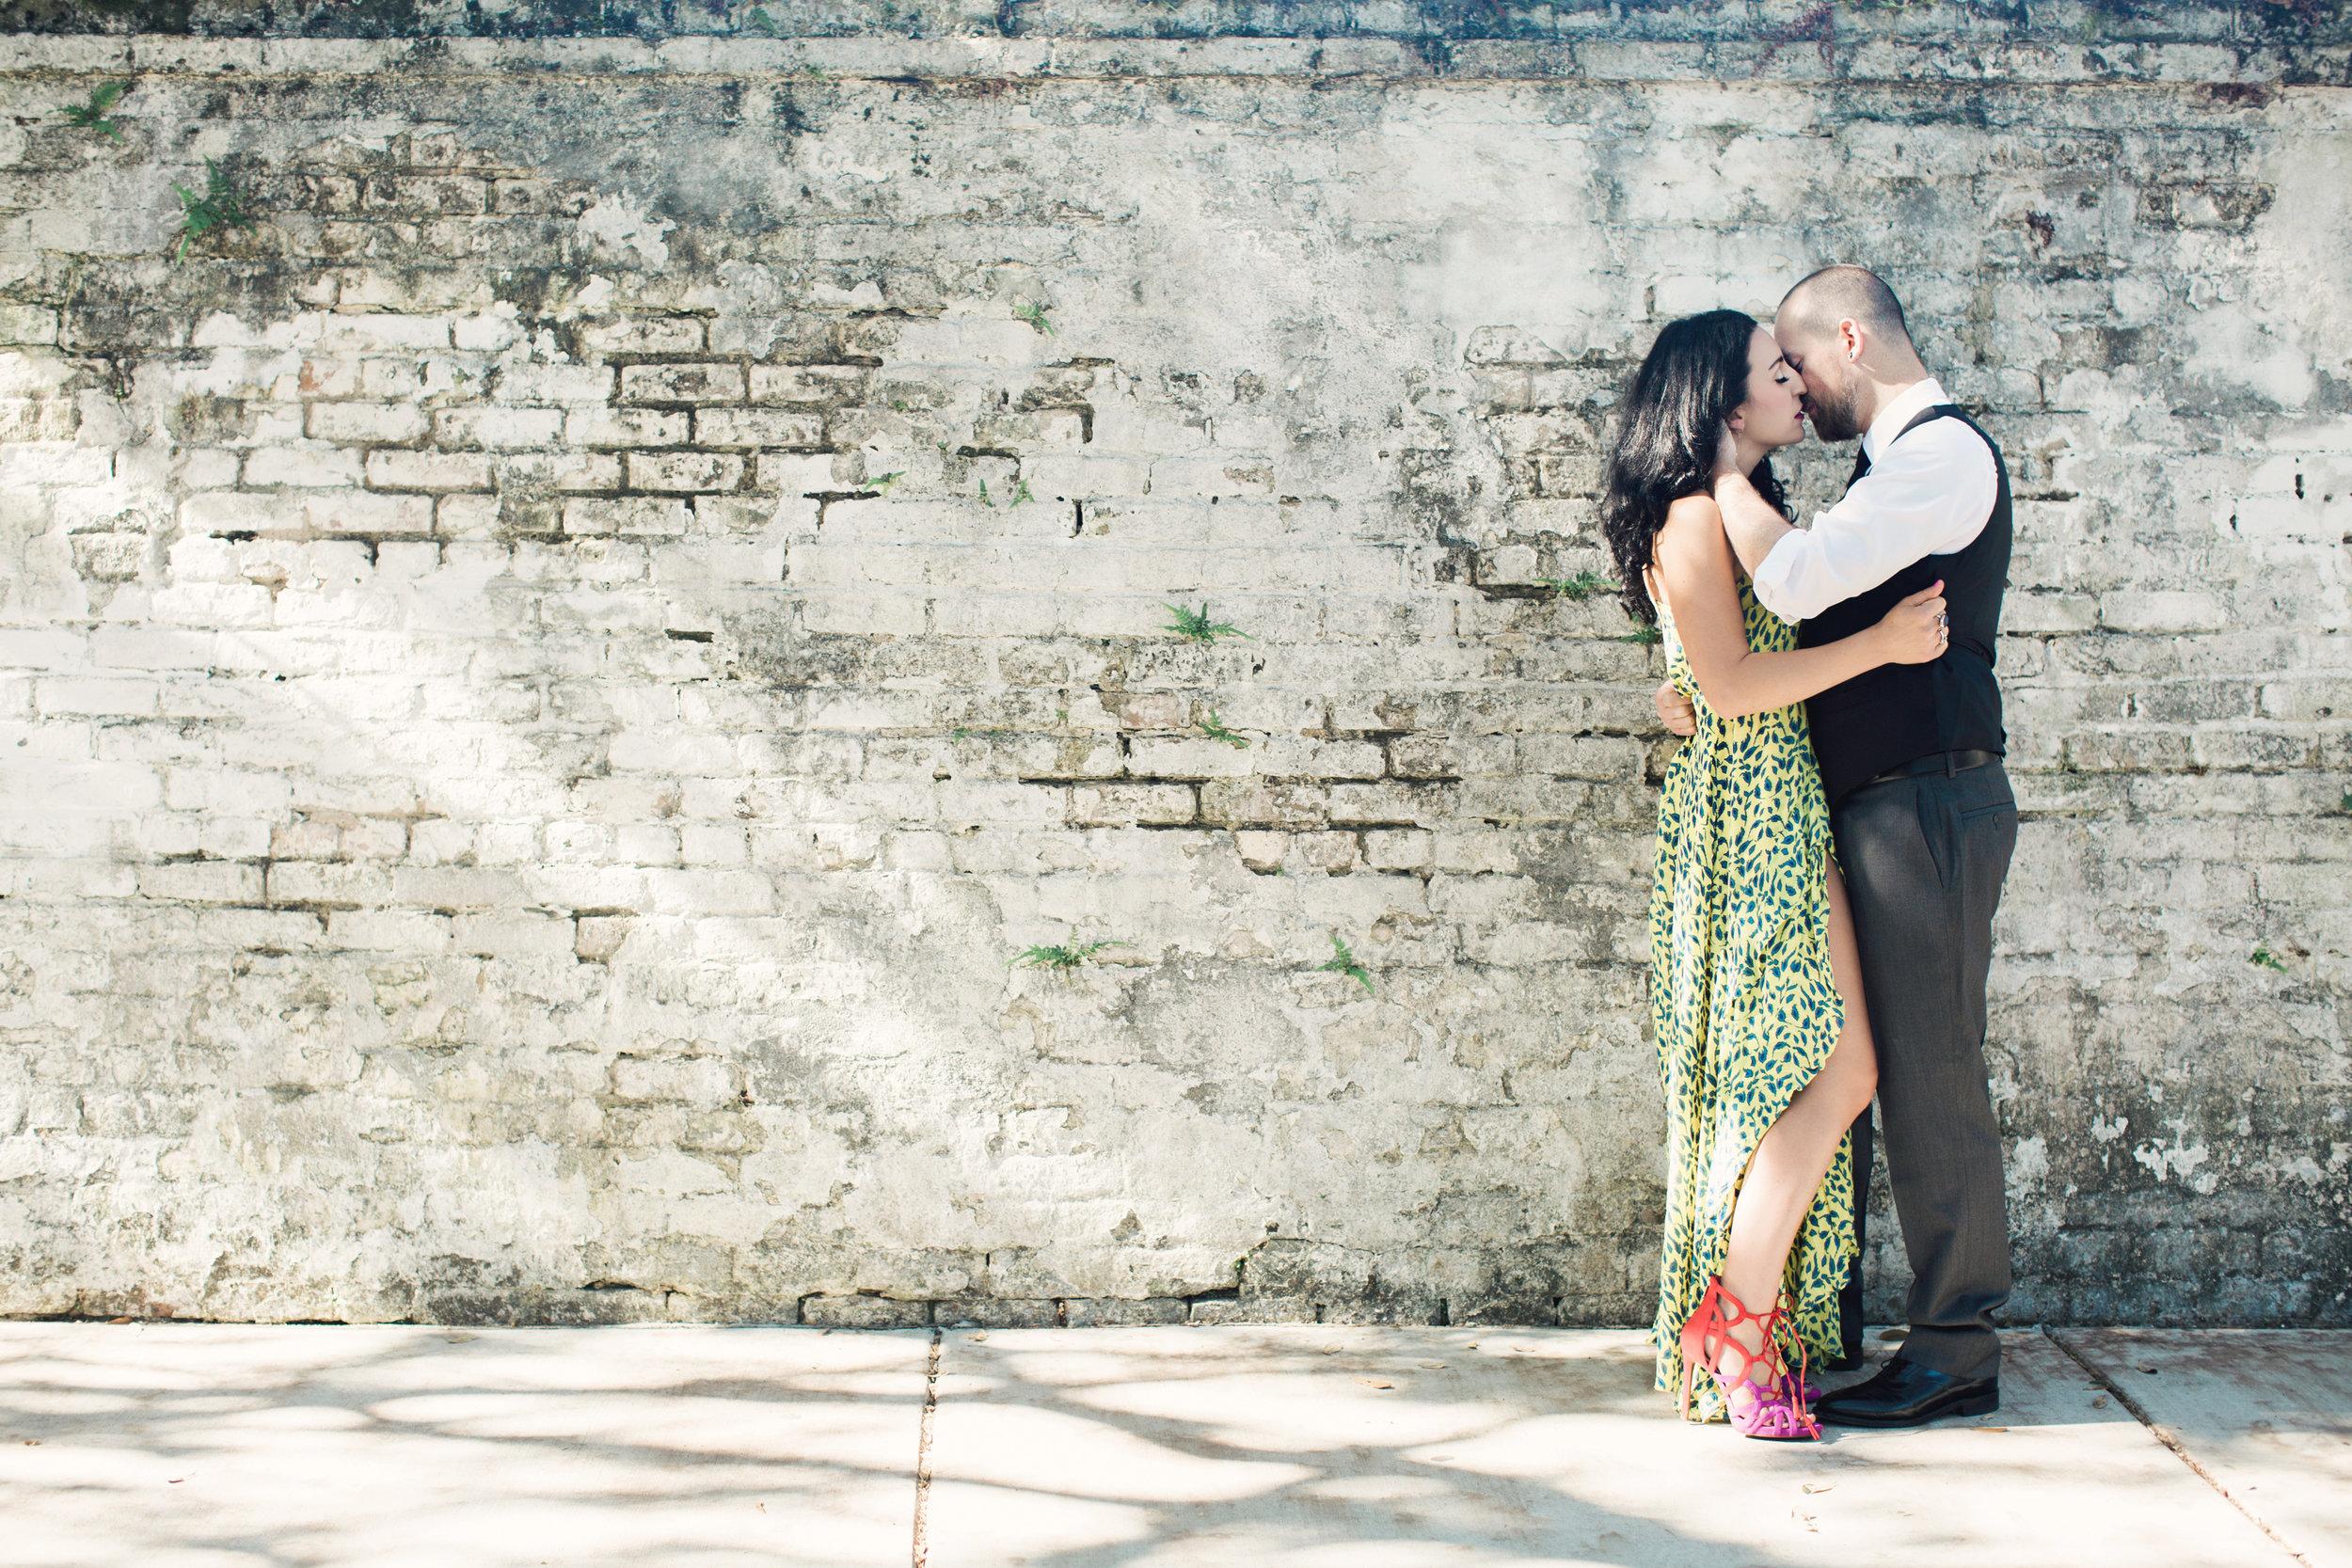 CindyGiovagnoliPhotography_Seattle_Washington_PNW_Couple_Engagement_Portrait_Photography-026.jpg